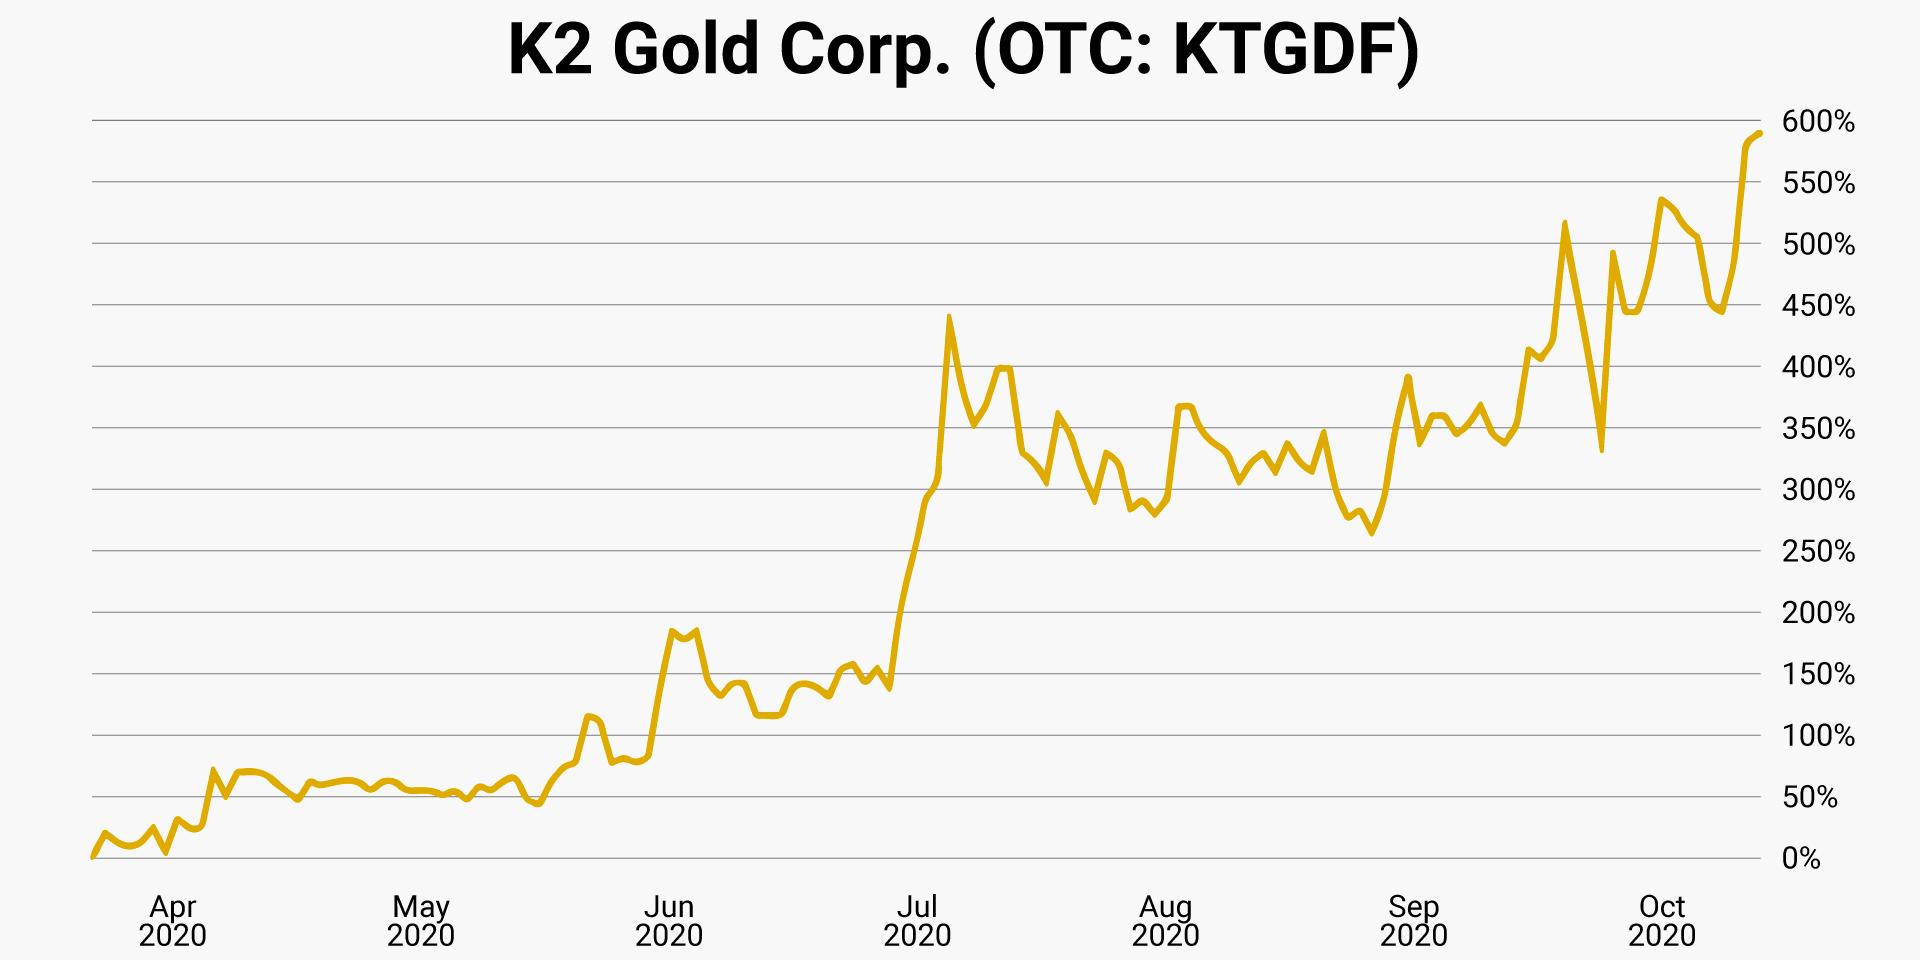 08-k2-gold-corp-otc-ktgdf